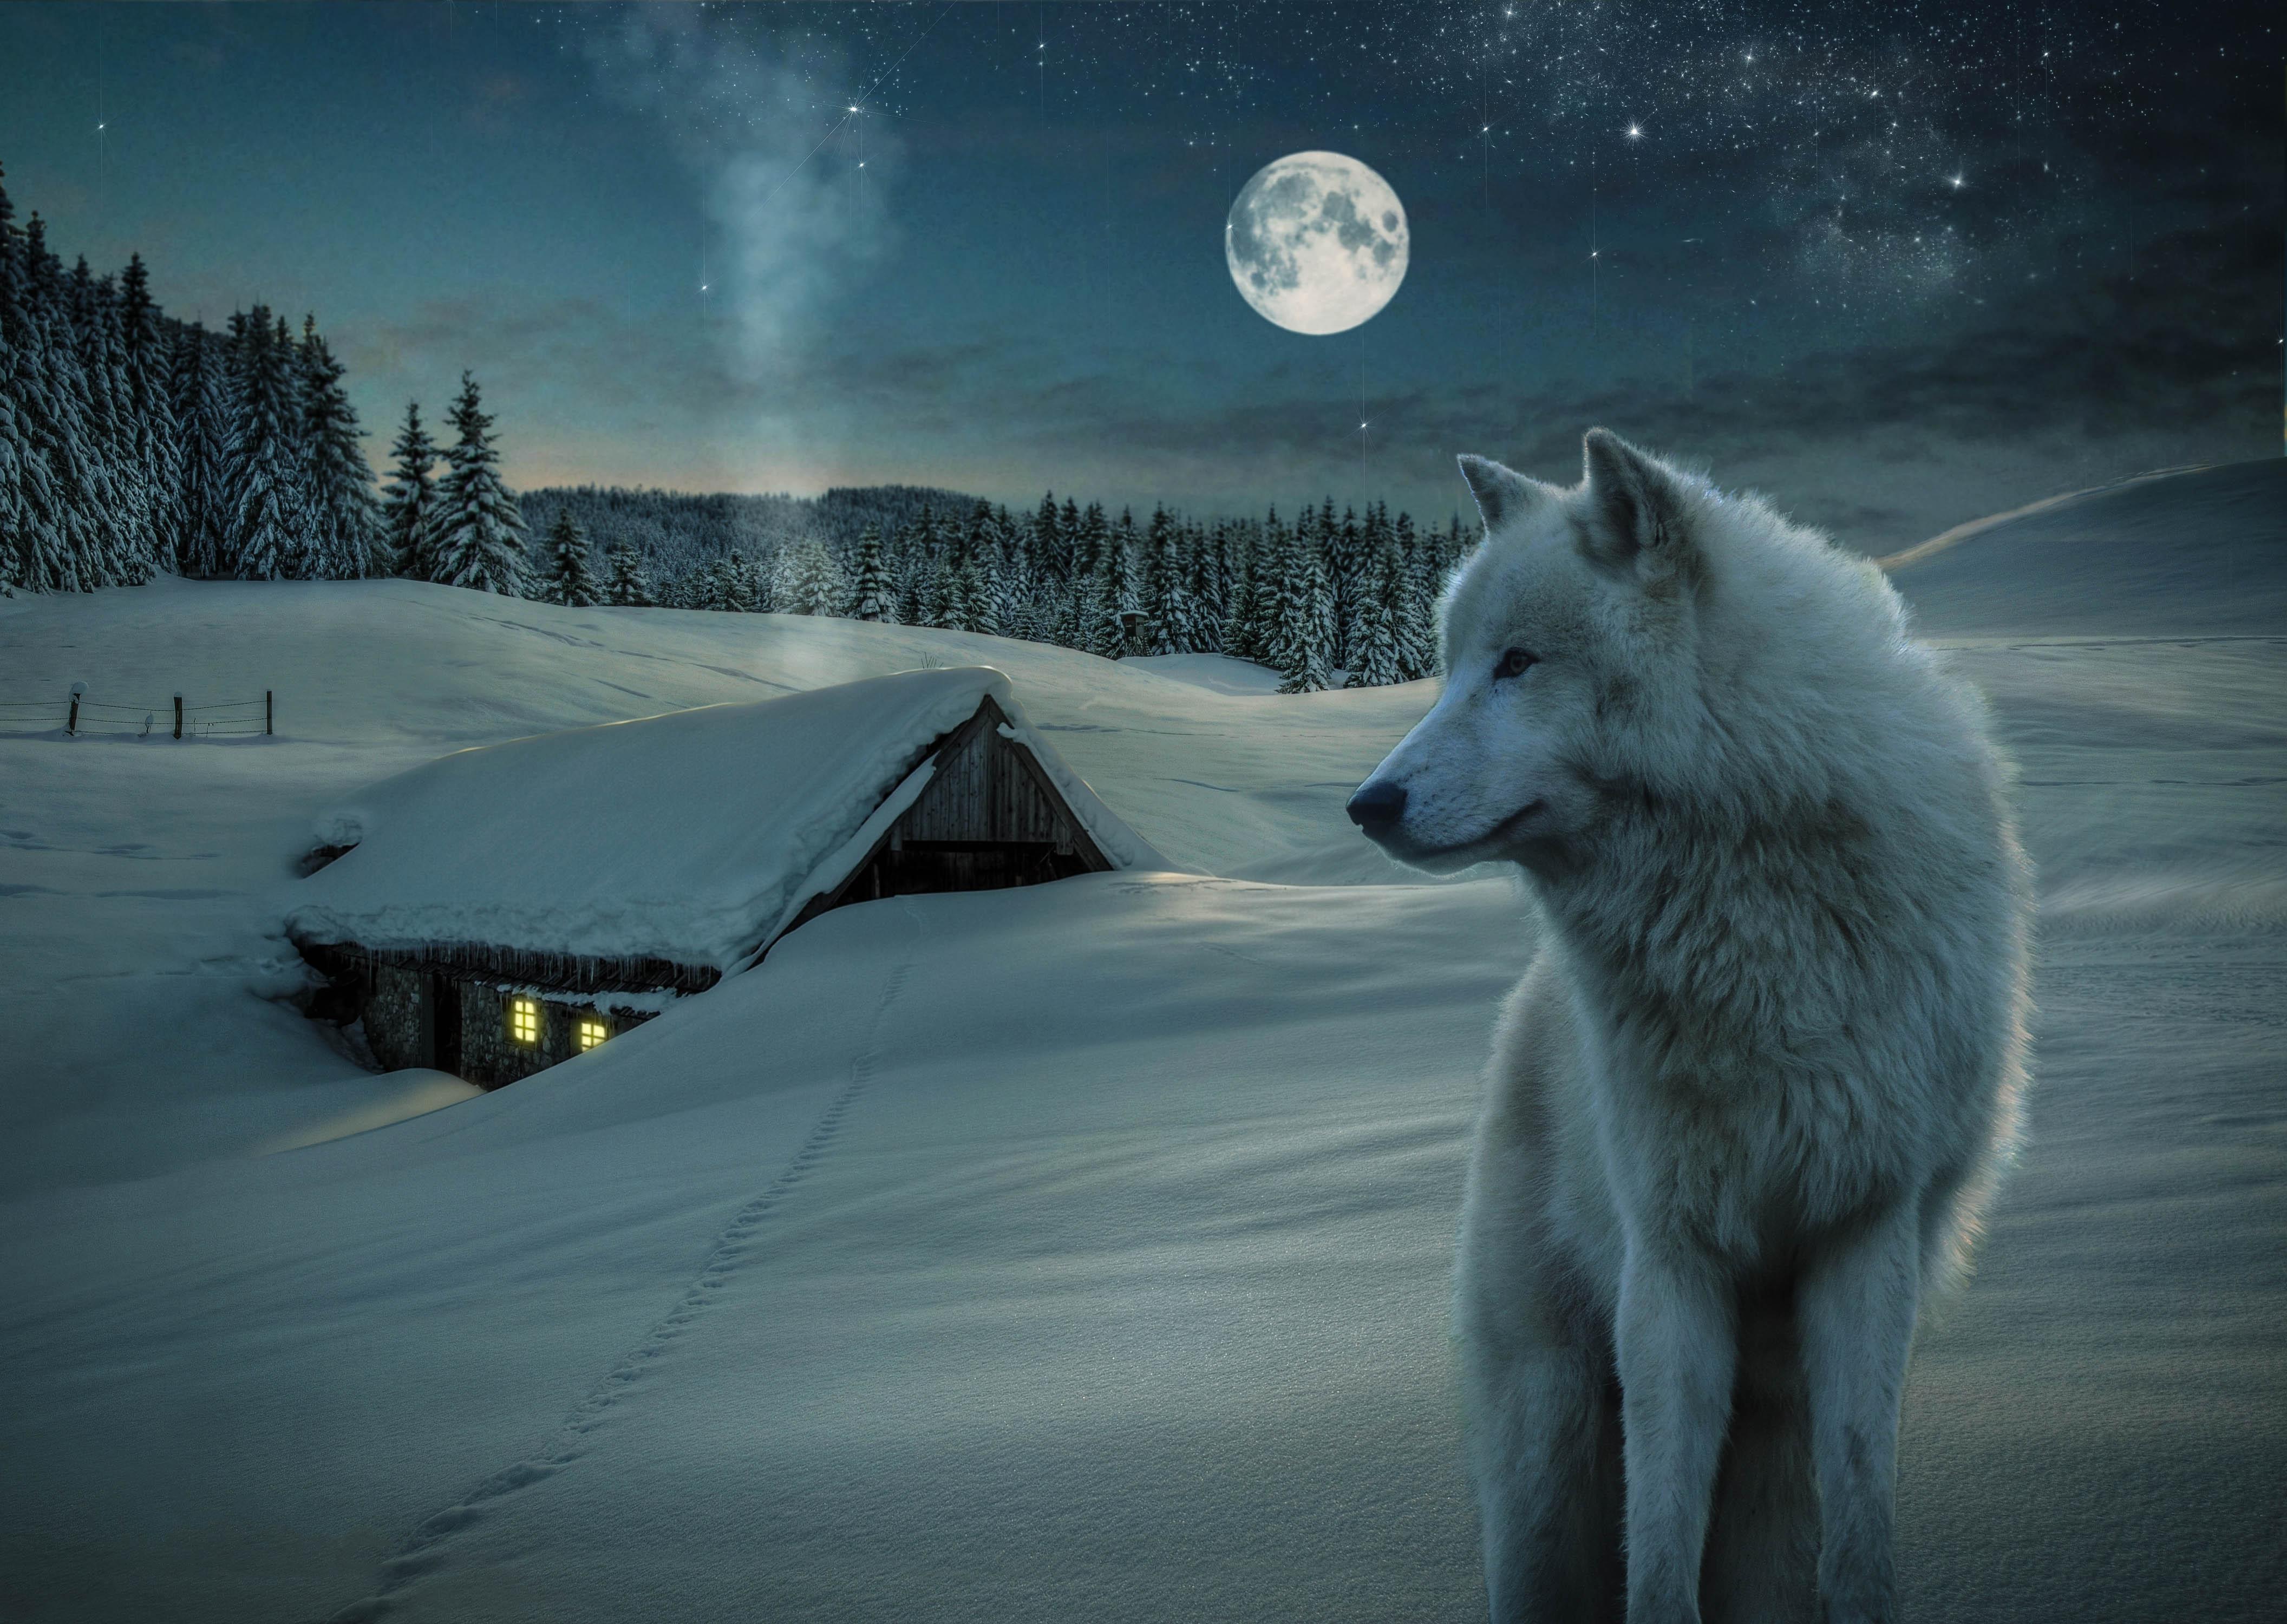 white wolf in winter field 4k ultra hd wallpaper. Black Bedroom Furniture Sets. Home Design Ideas